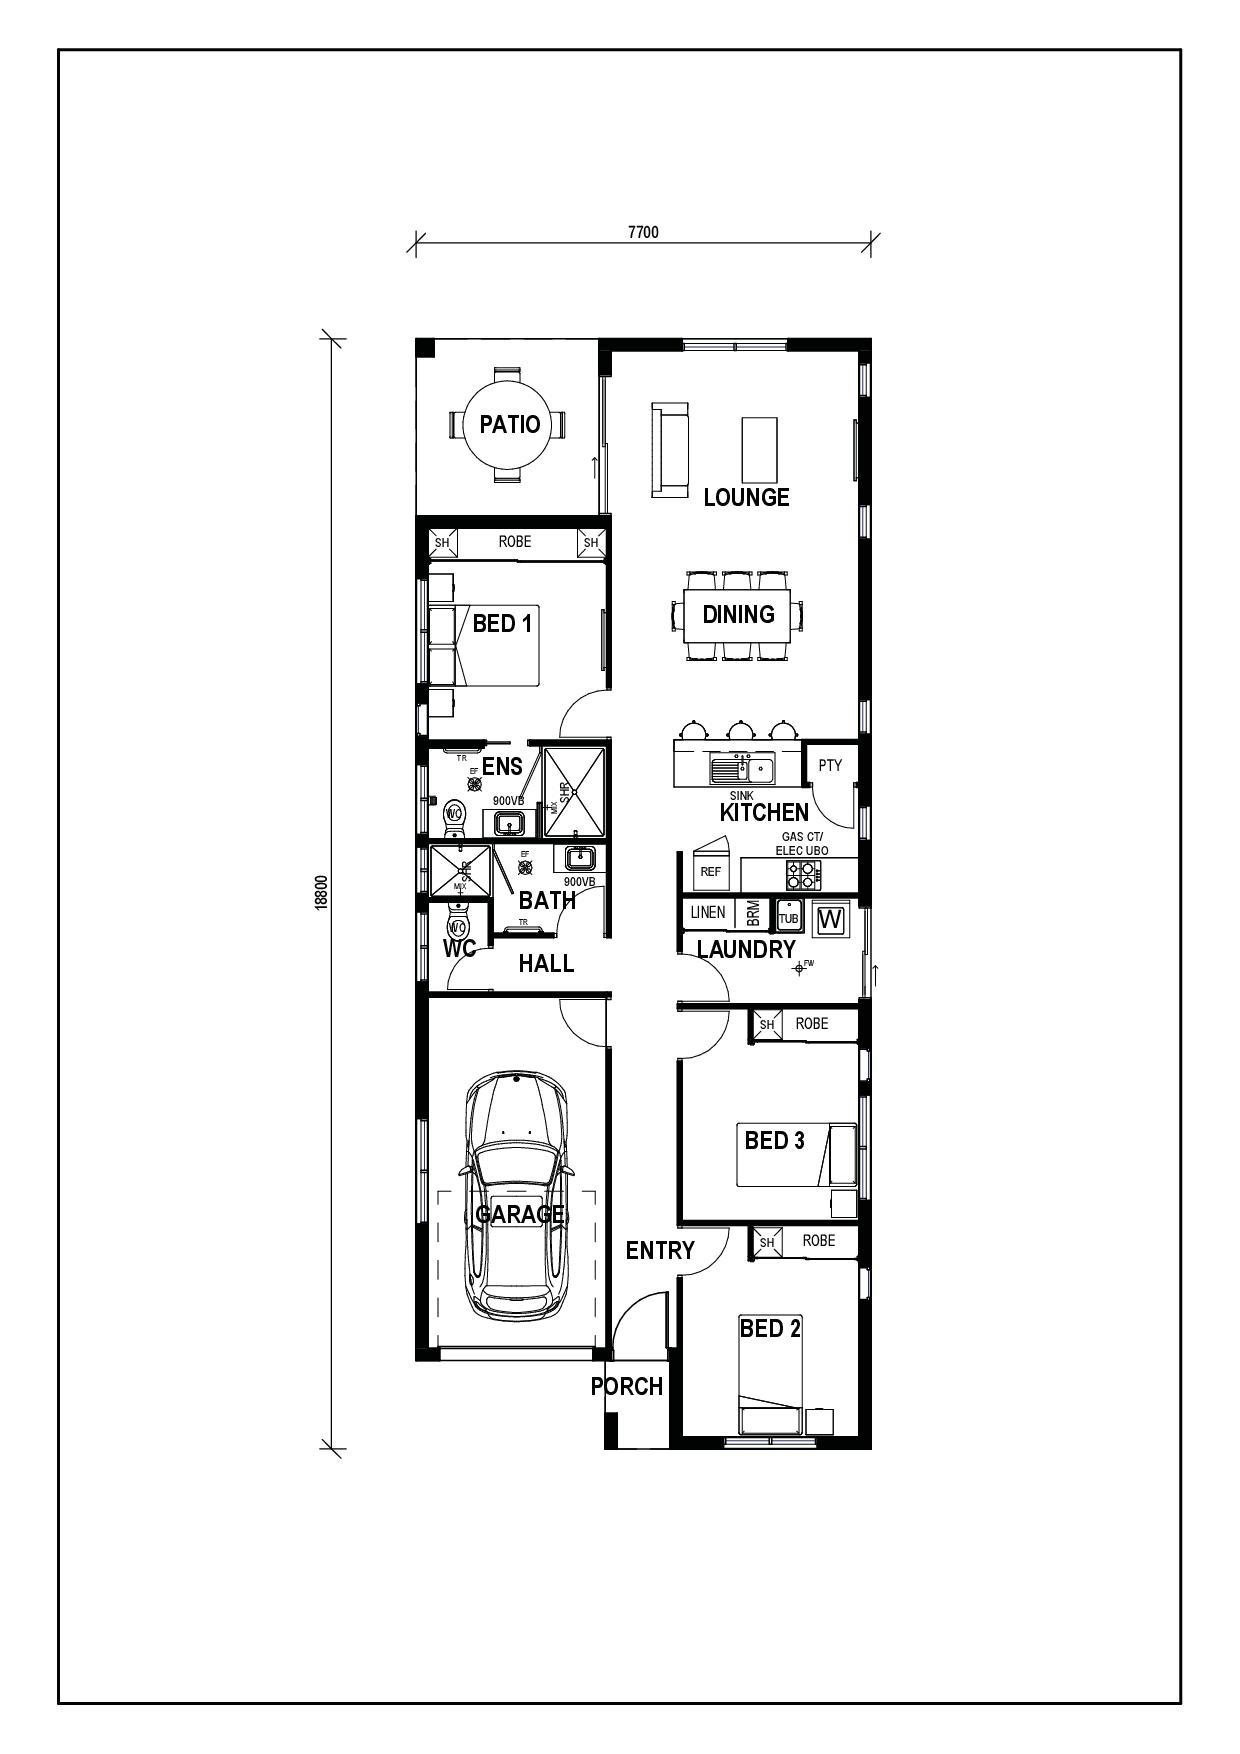 Culmara A 139 Single Garage Floor Plan.jpg